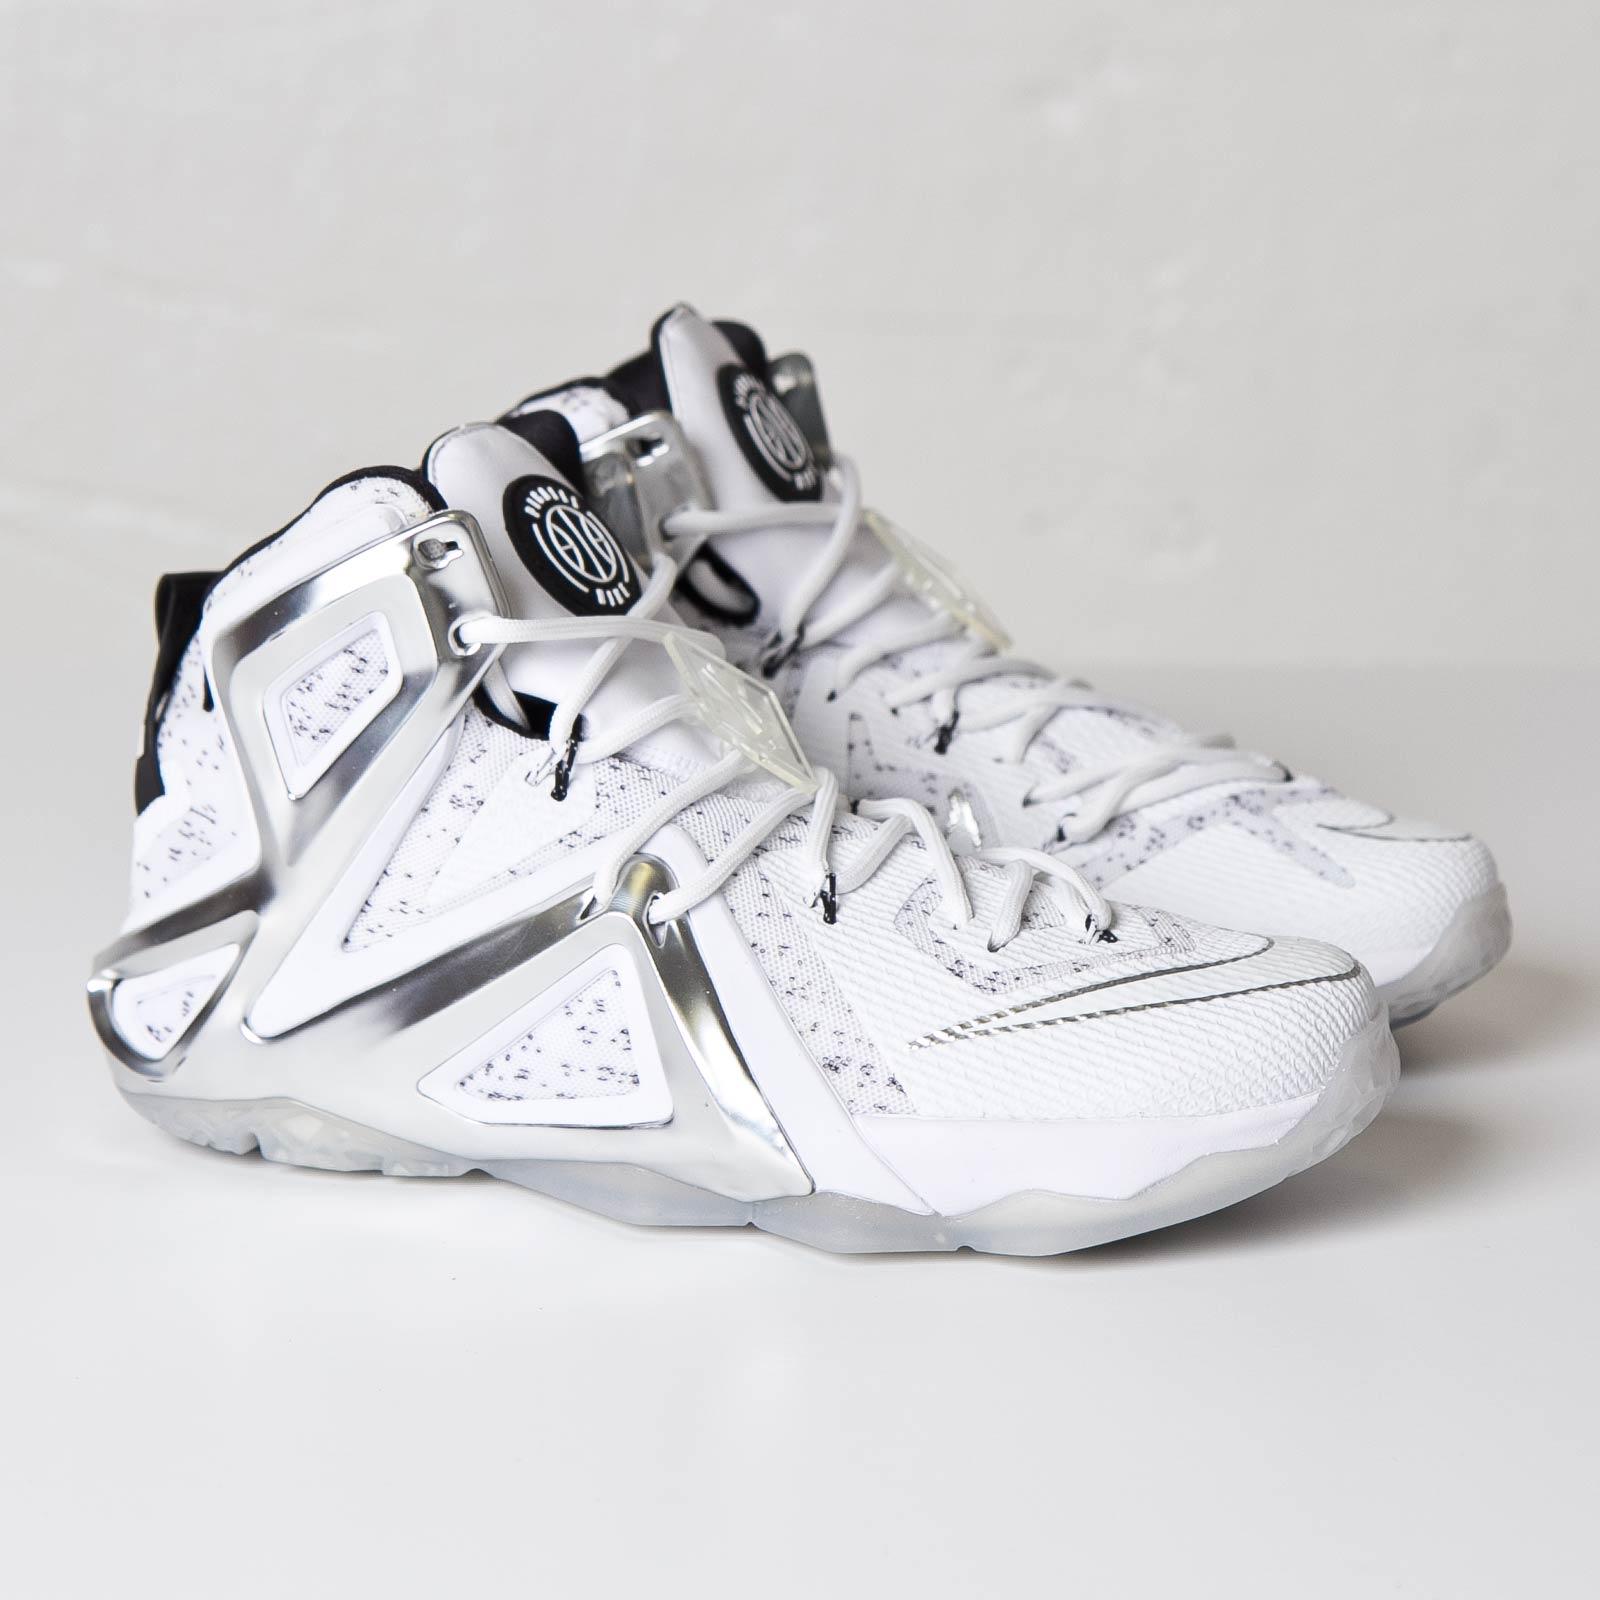 Nike Lebron XII Elite SP / Pigalle